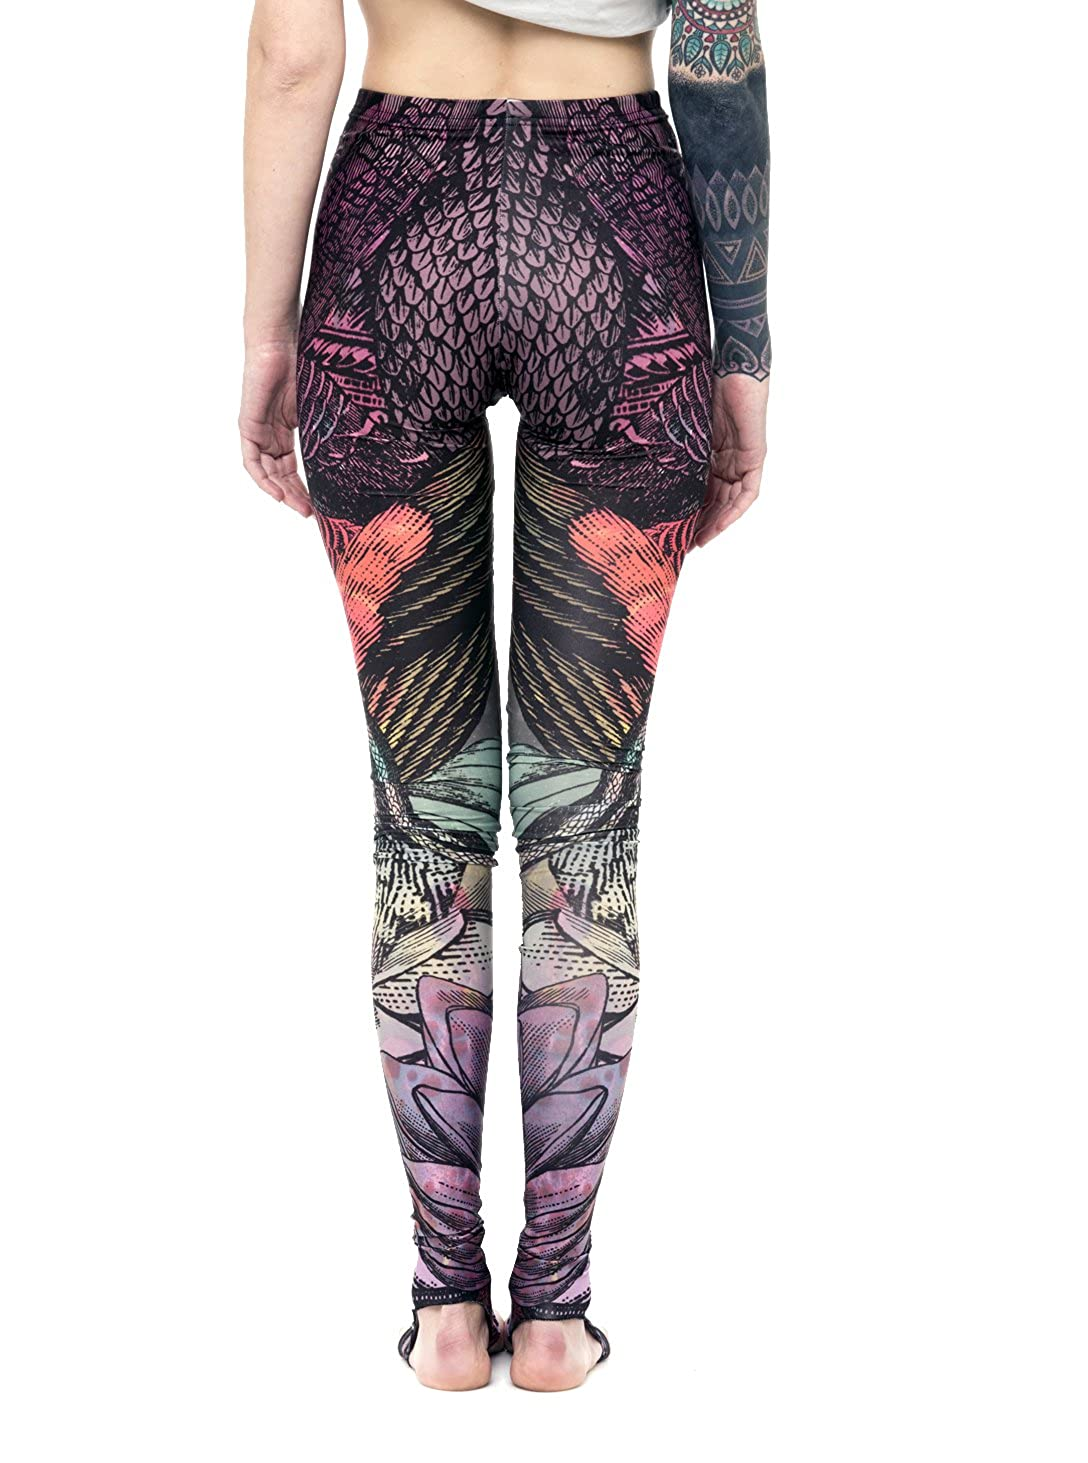 729f9ceab7b90b Tribal Print Yoga Leggings - High Waist with Stirrups - Urban Clothing for  Women at Amazon Women's Clothing store: